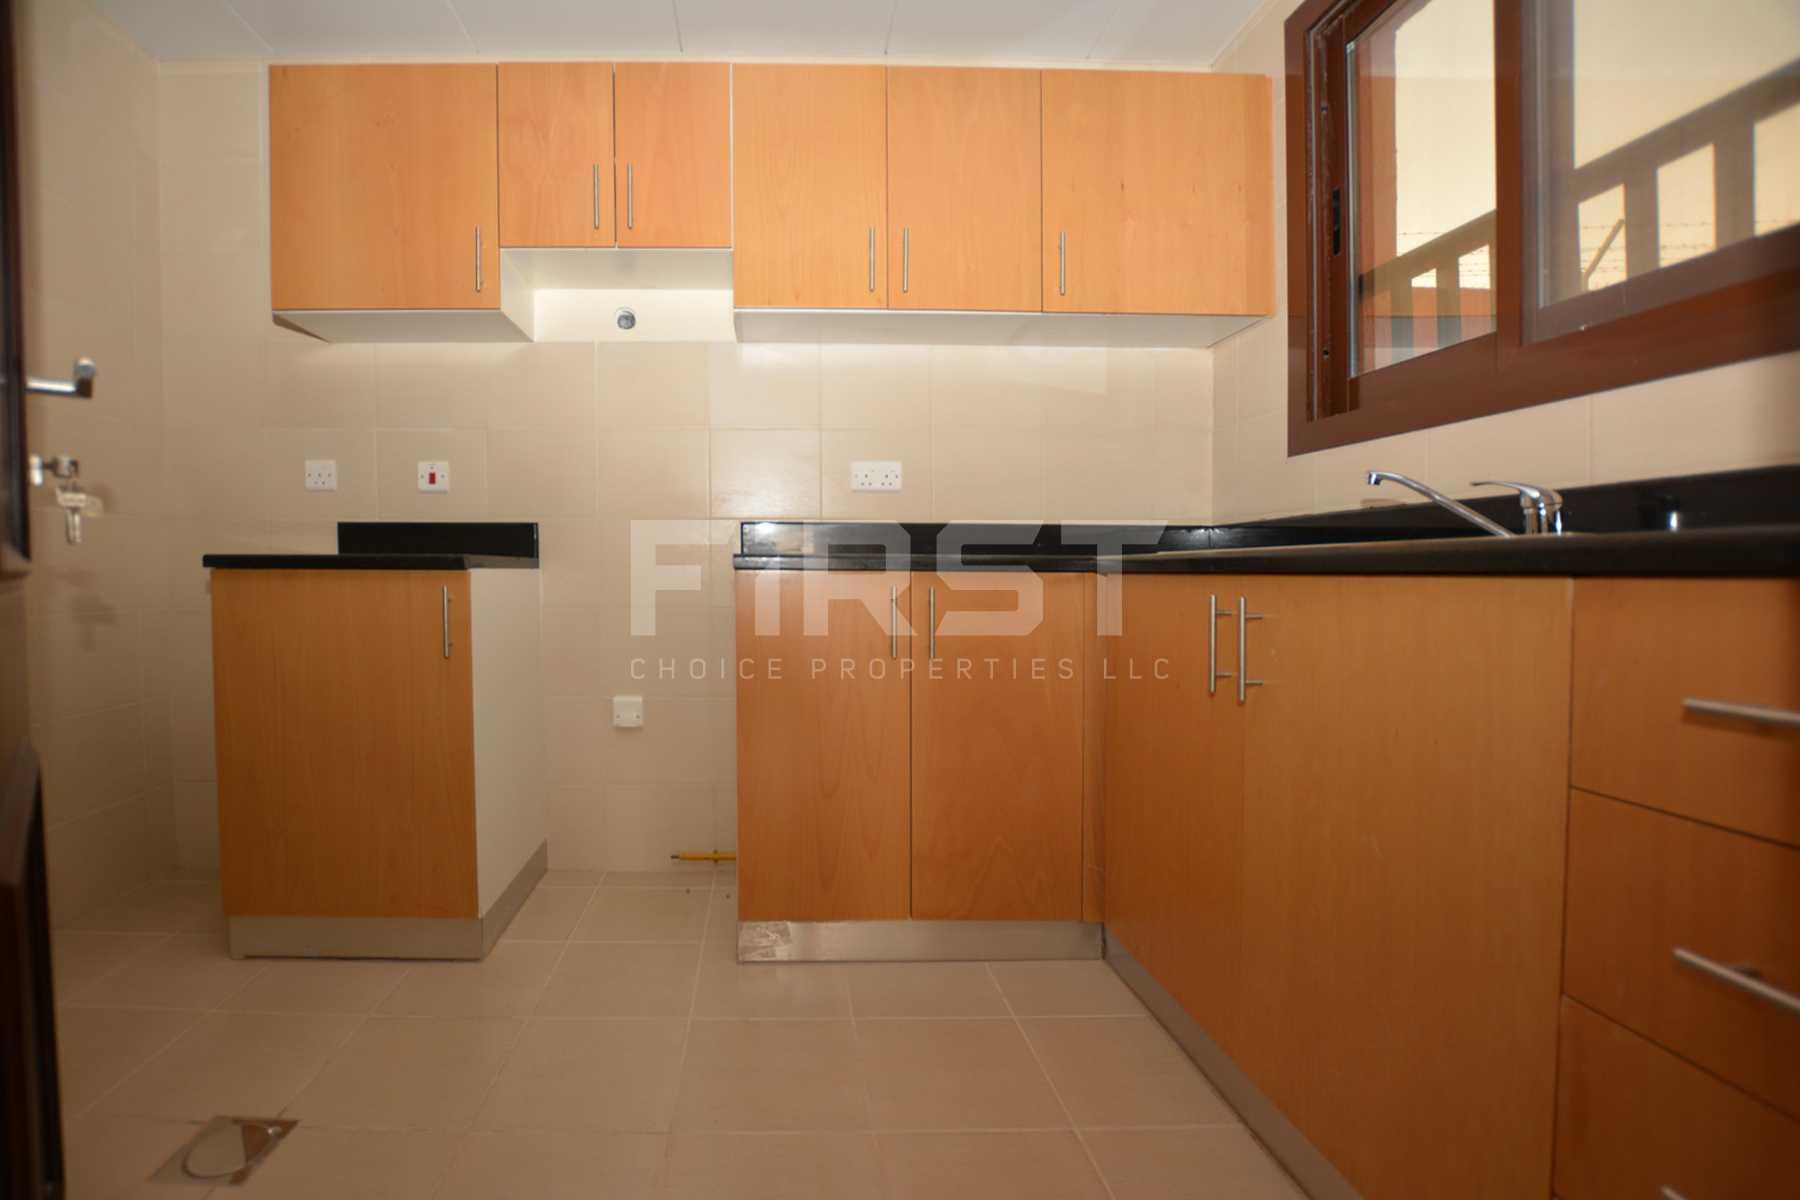 Internal Photo of 2 Bedroom Villa in Hydra Village Abu Dhabi UAE (9).jpg